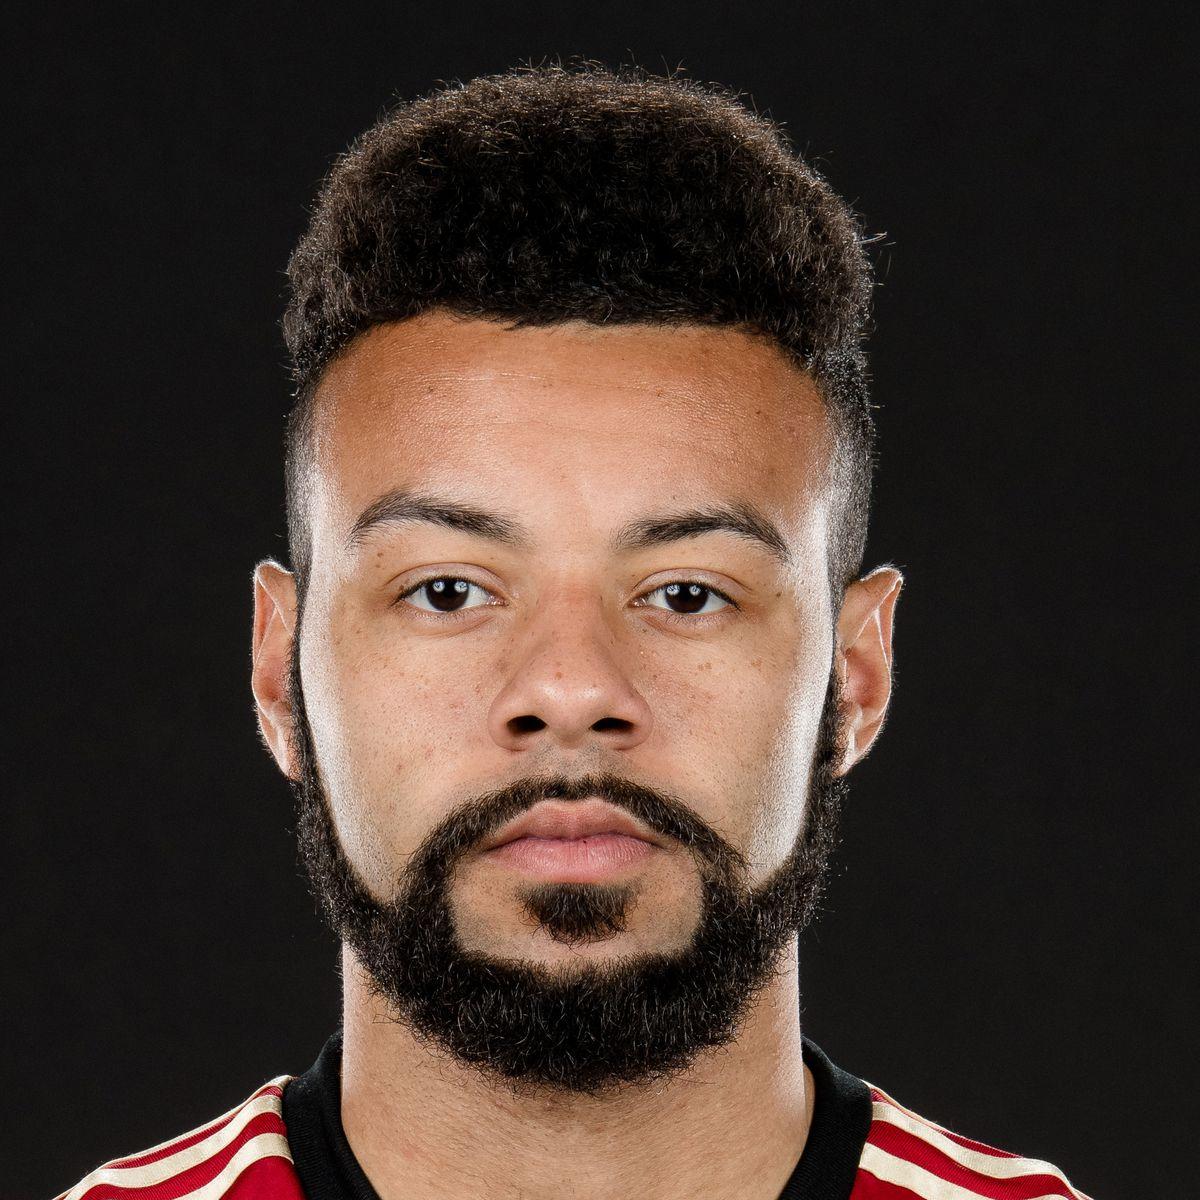 MLS: 2018 Portraits